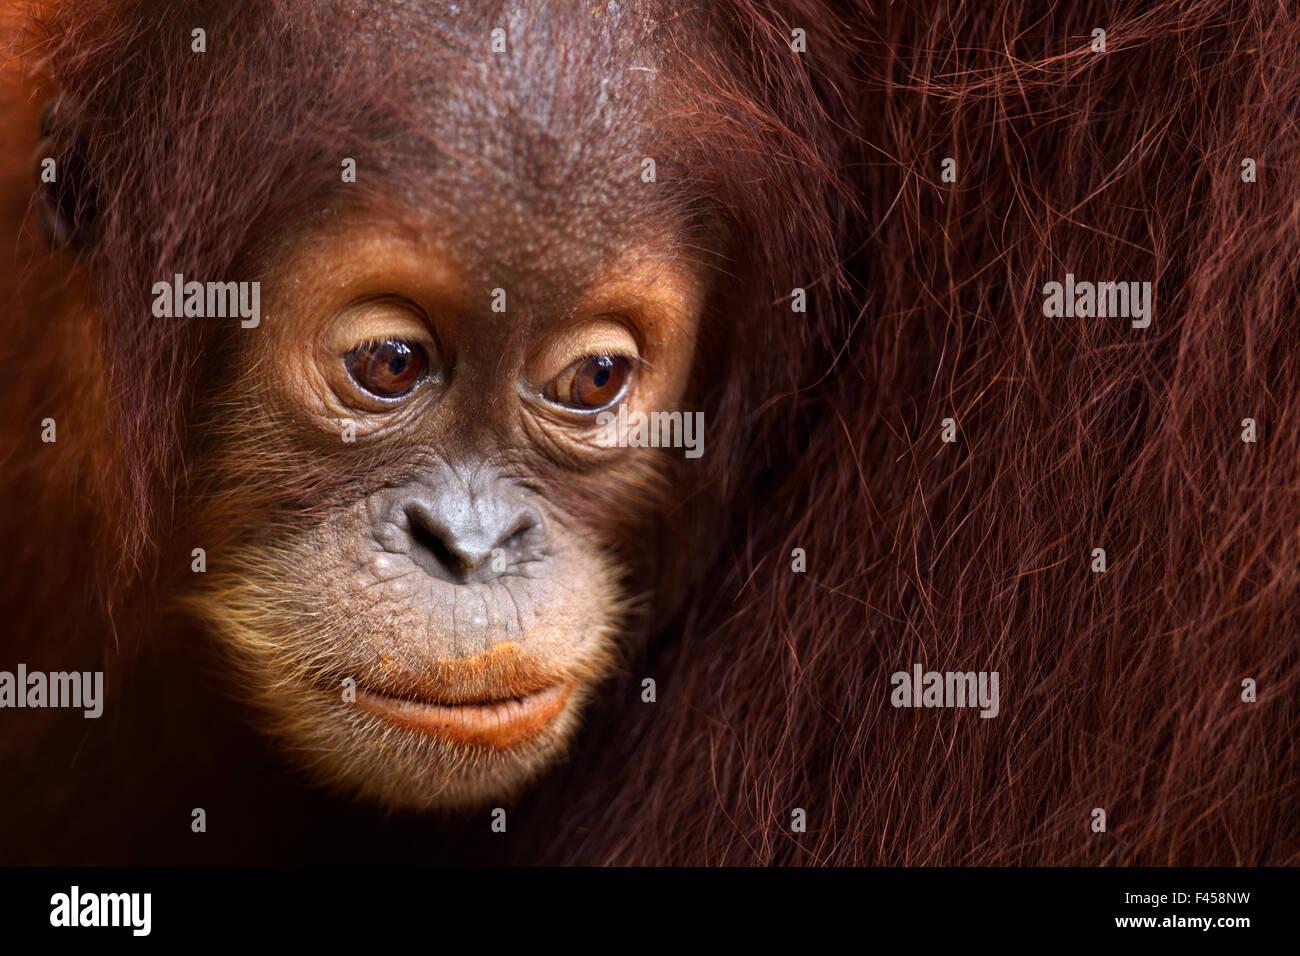 Sumatran orangutan (Pongo abelii) female baby 'Sumi' aged 2-3 years portrait. Gunung Leuser National Park, - Stock Image